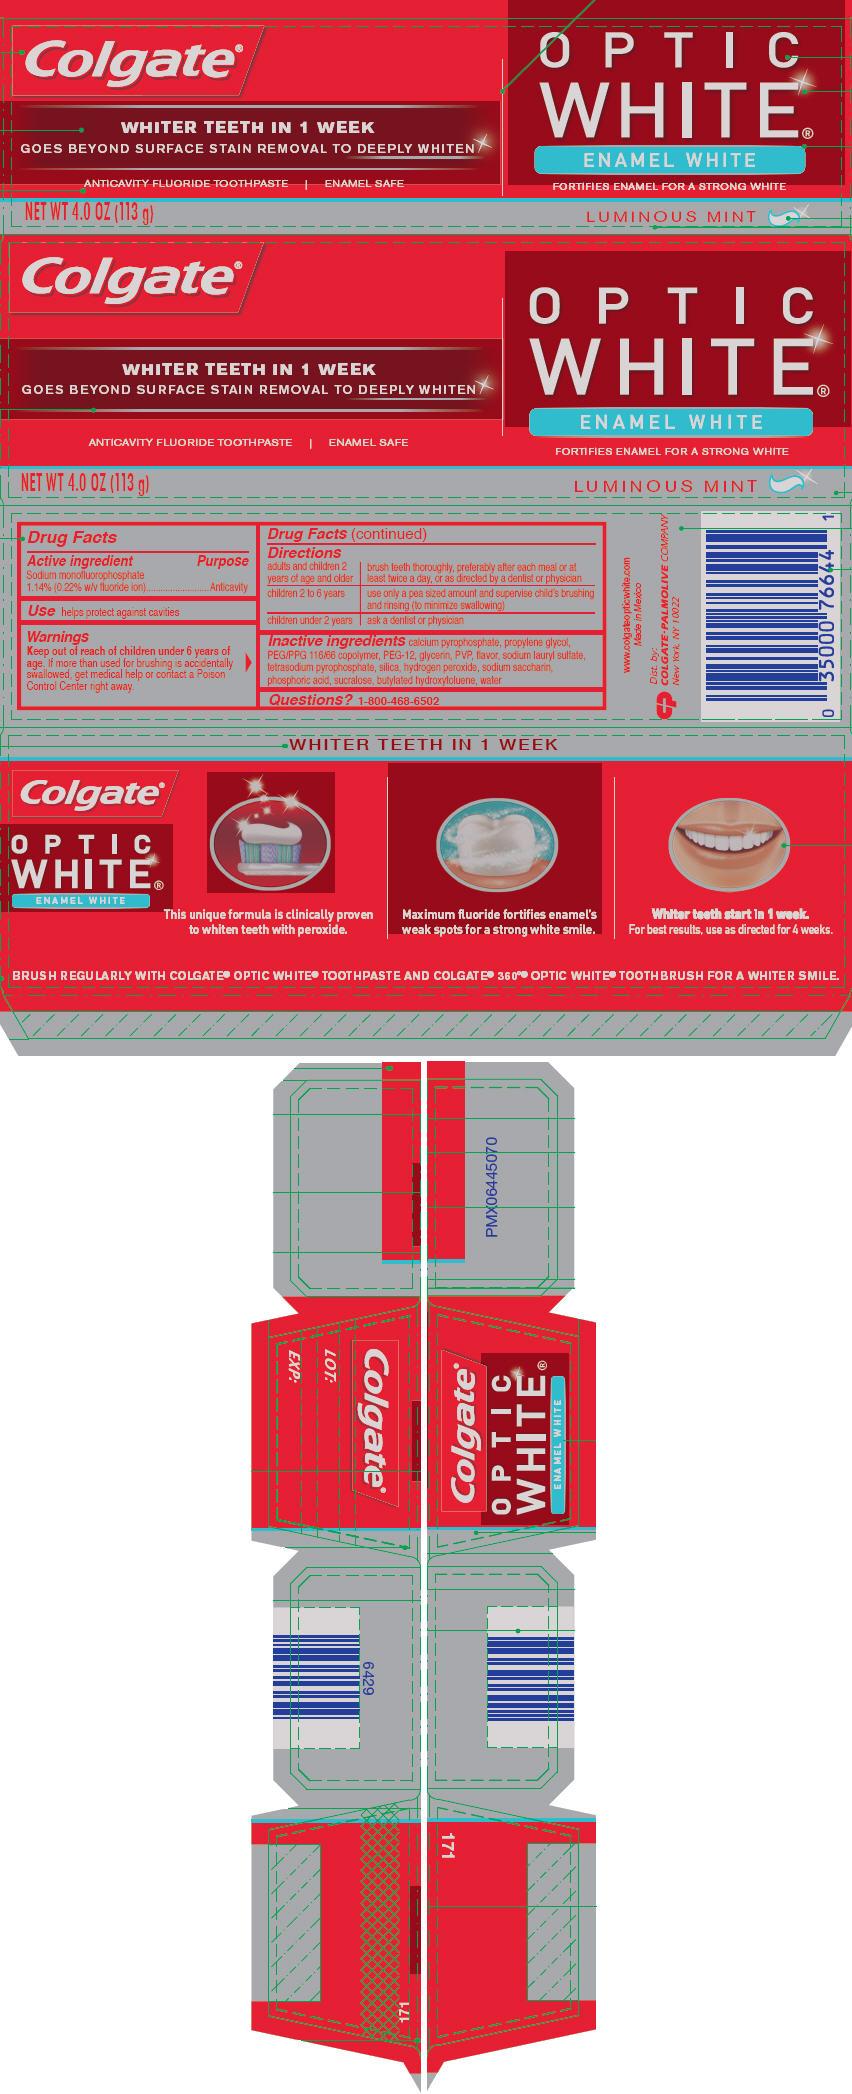 Colgate Optic White Enamel White (Sodium Monofluorophosphate) Paste, Dentifrice [Mission Hills S.a De C.v]